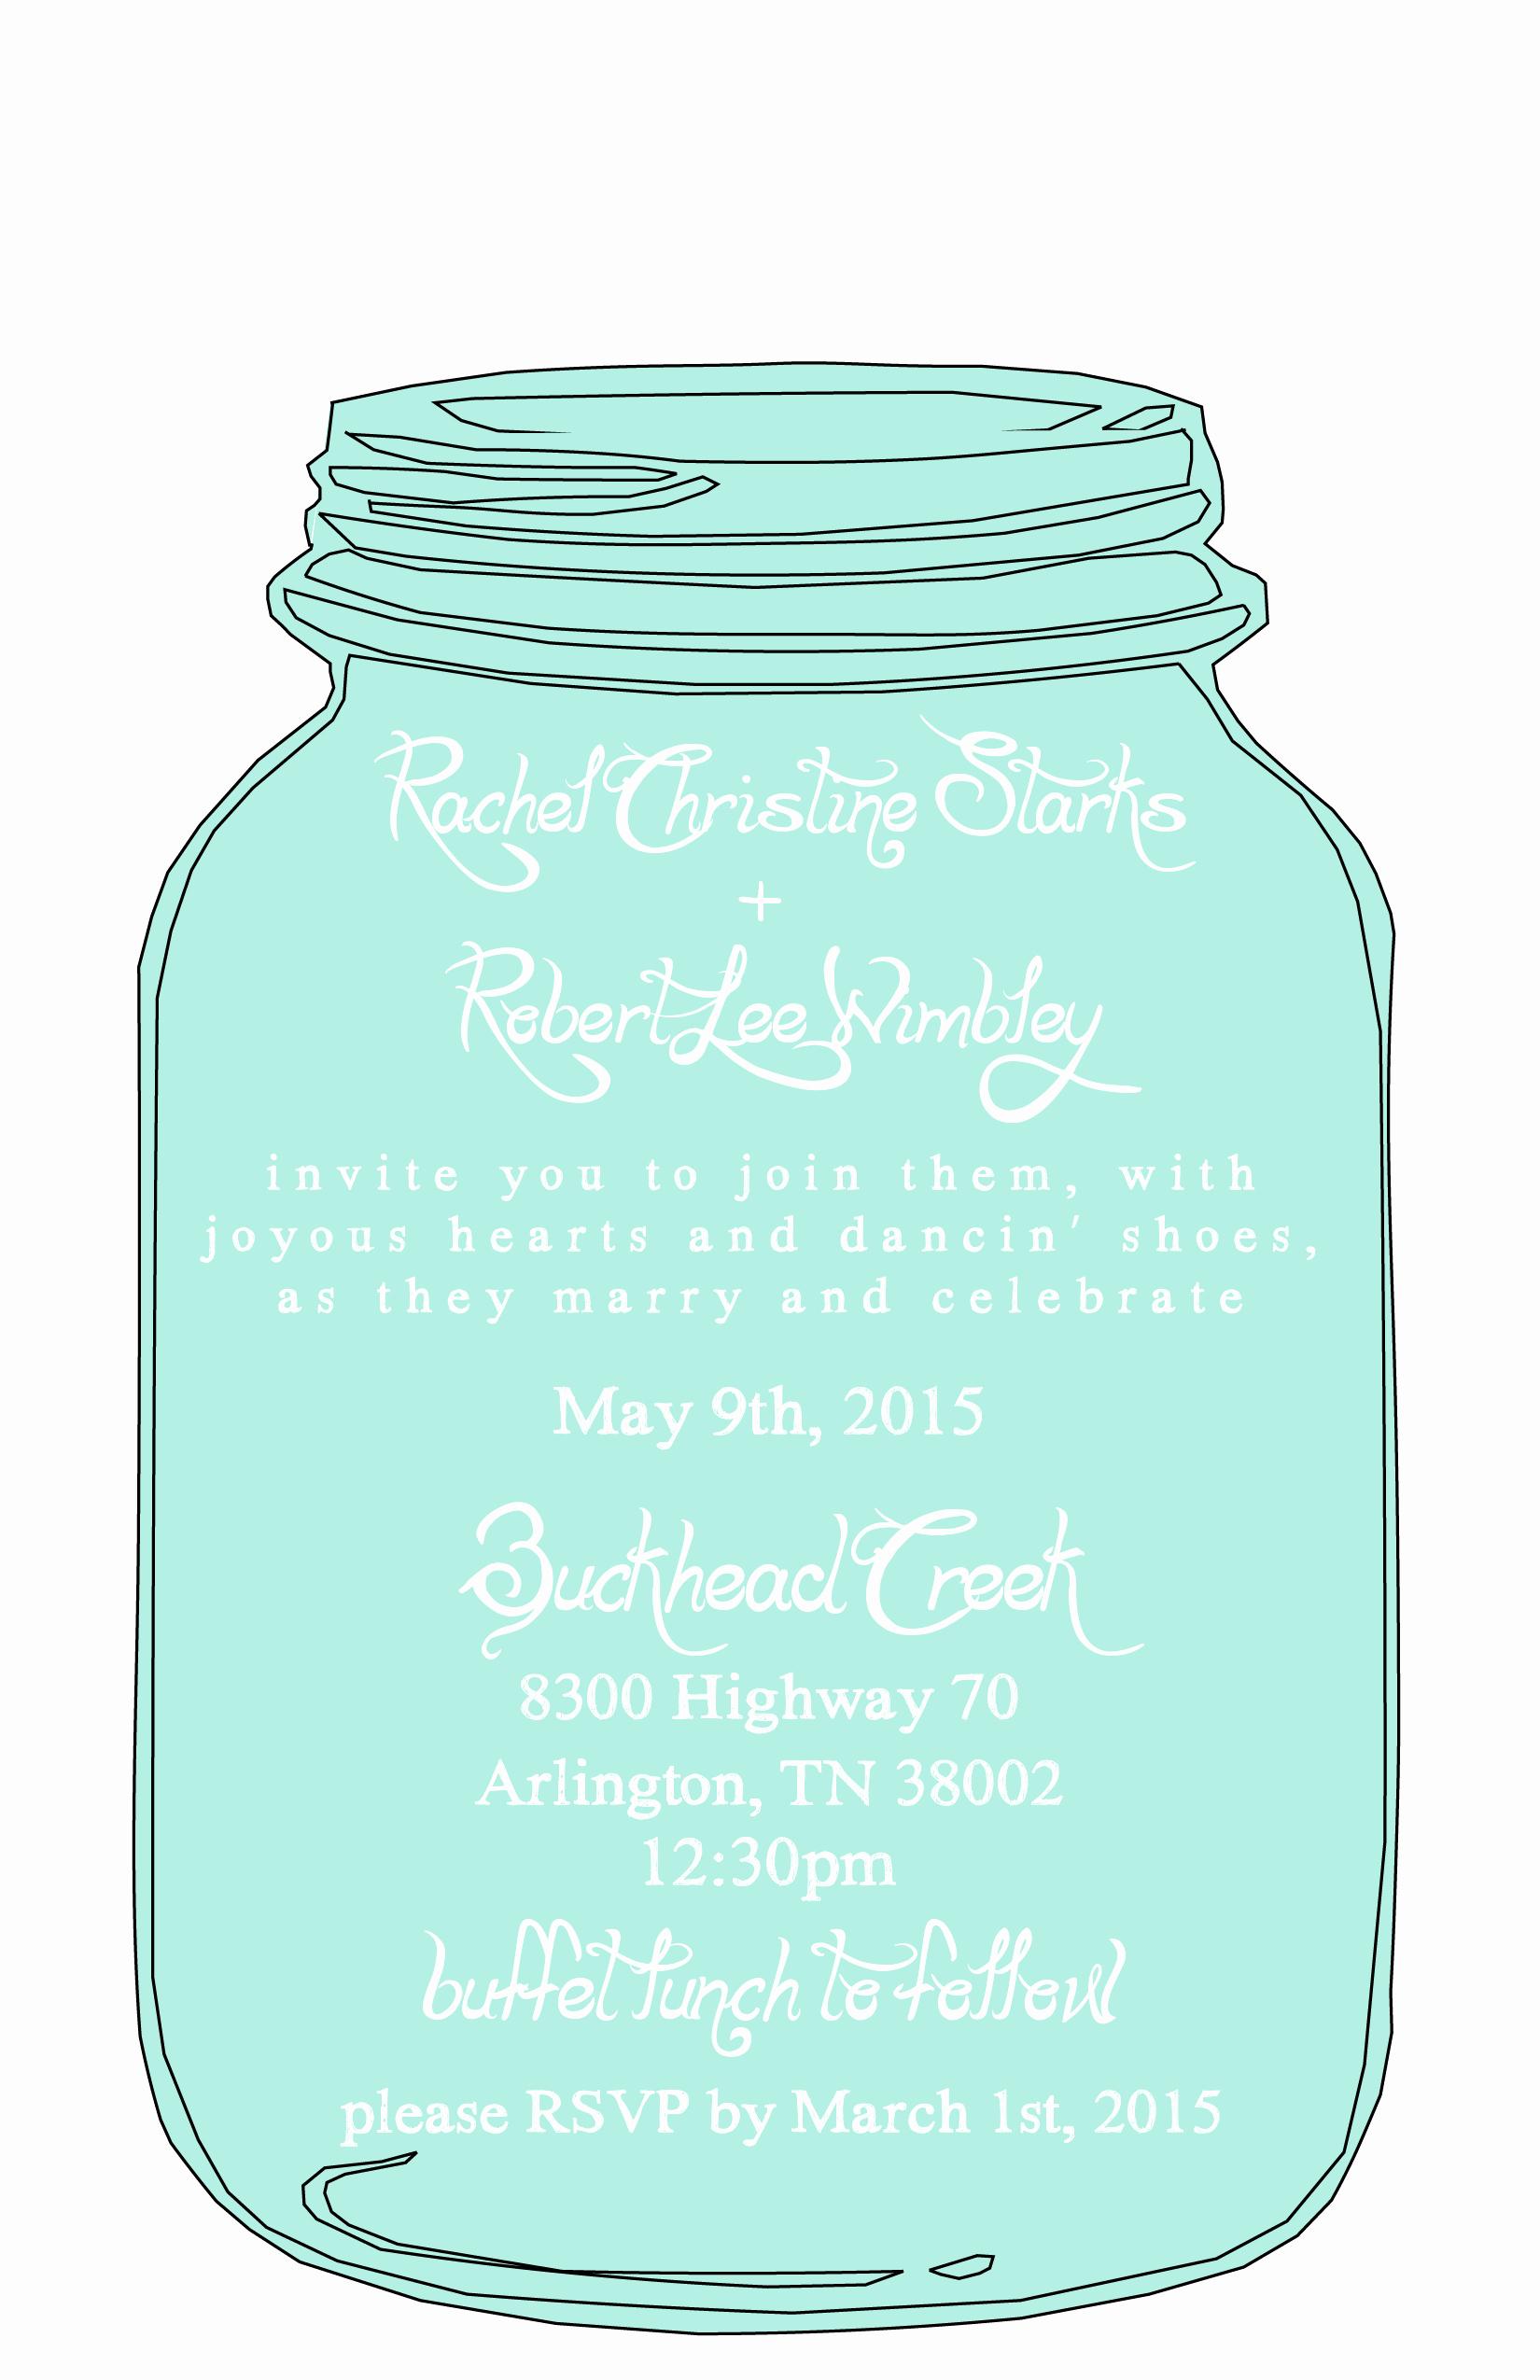 Free Printable Invitations Templates New Mason Jar Free Printable Wedding Invitations Templates